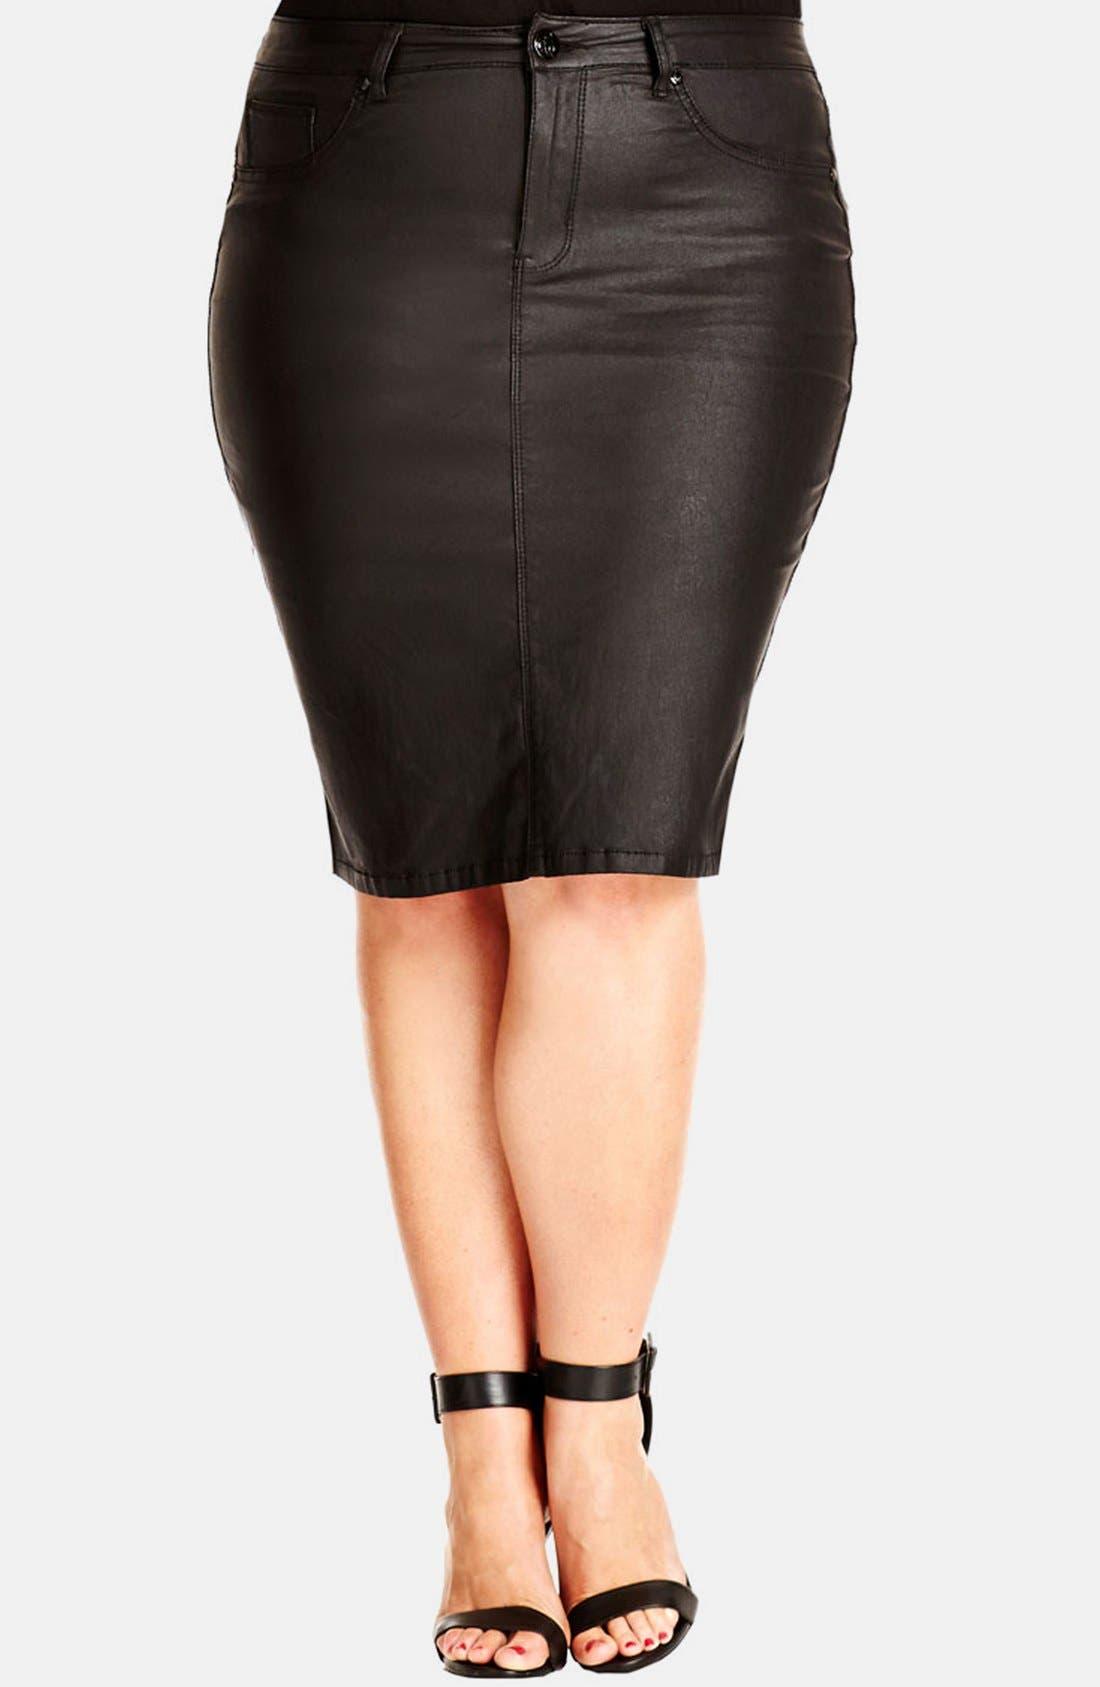 Main Image - City Chic 'Wet Look' Pencil Skirt (Plus Size)